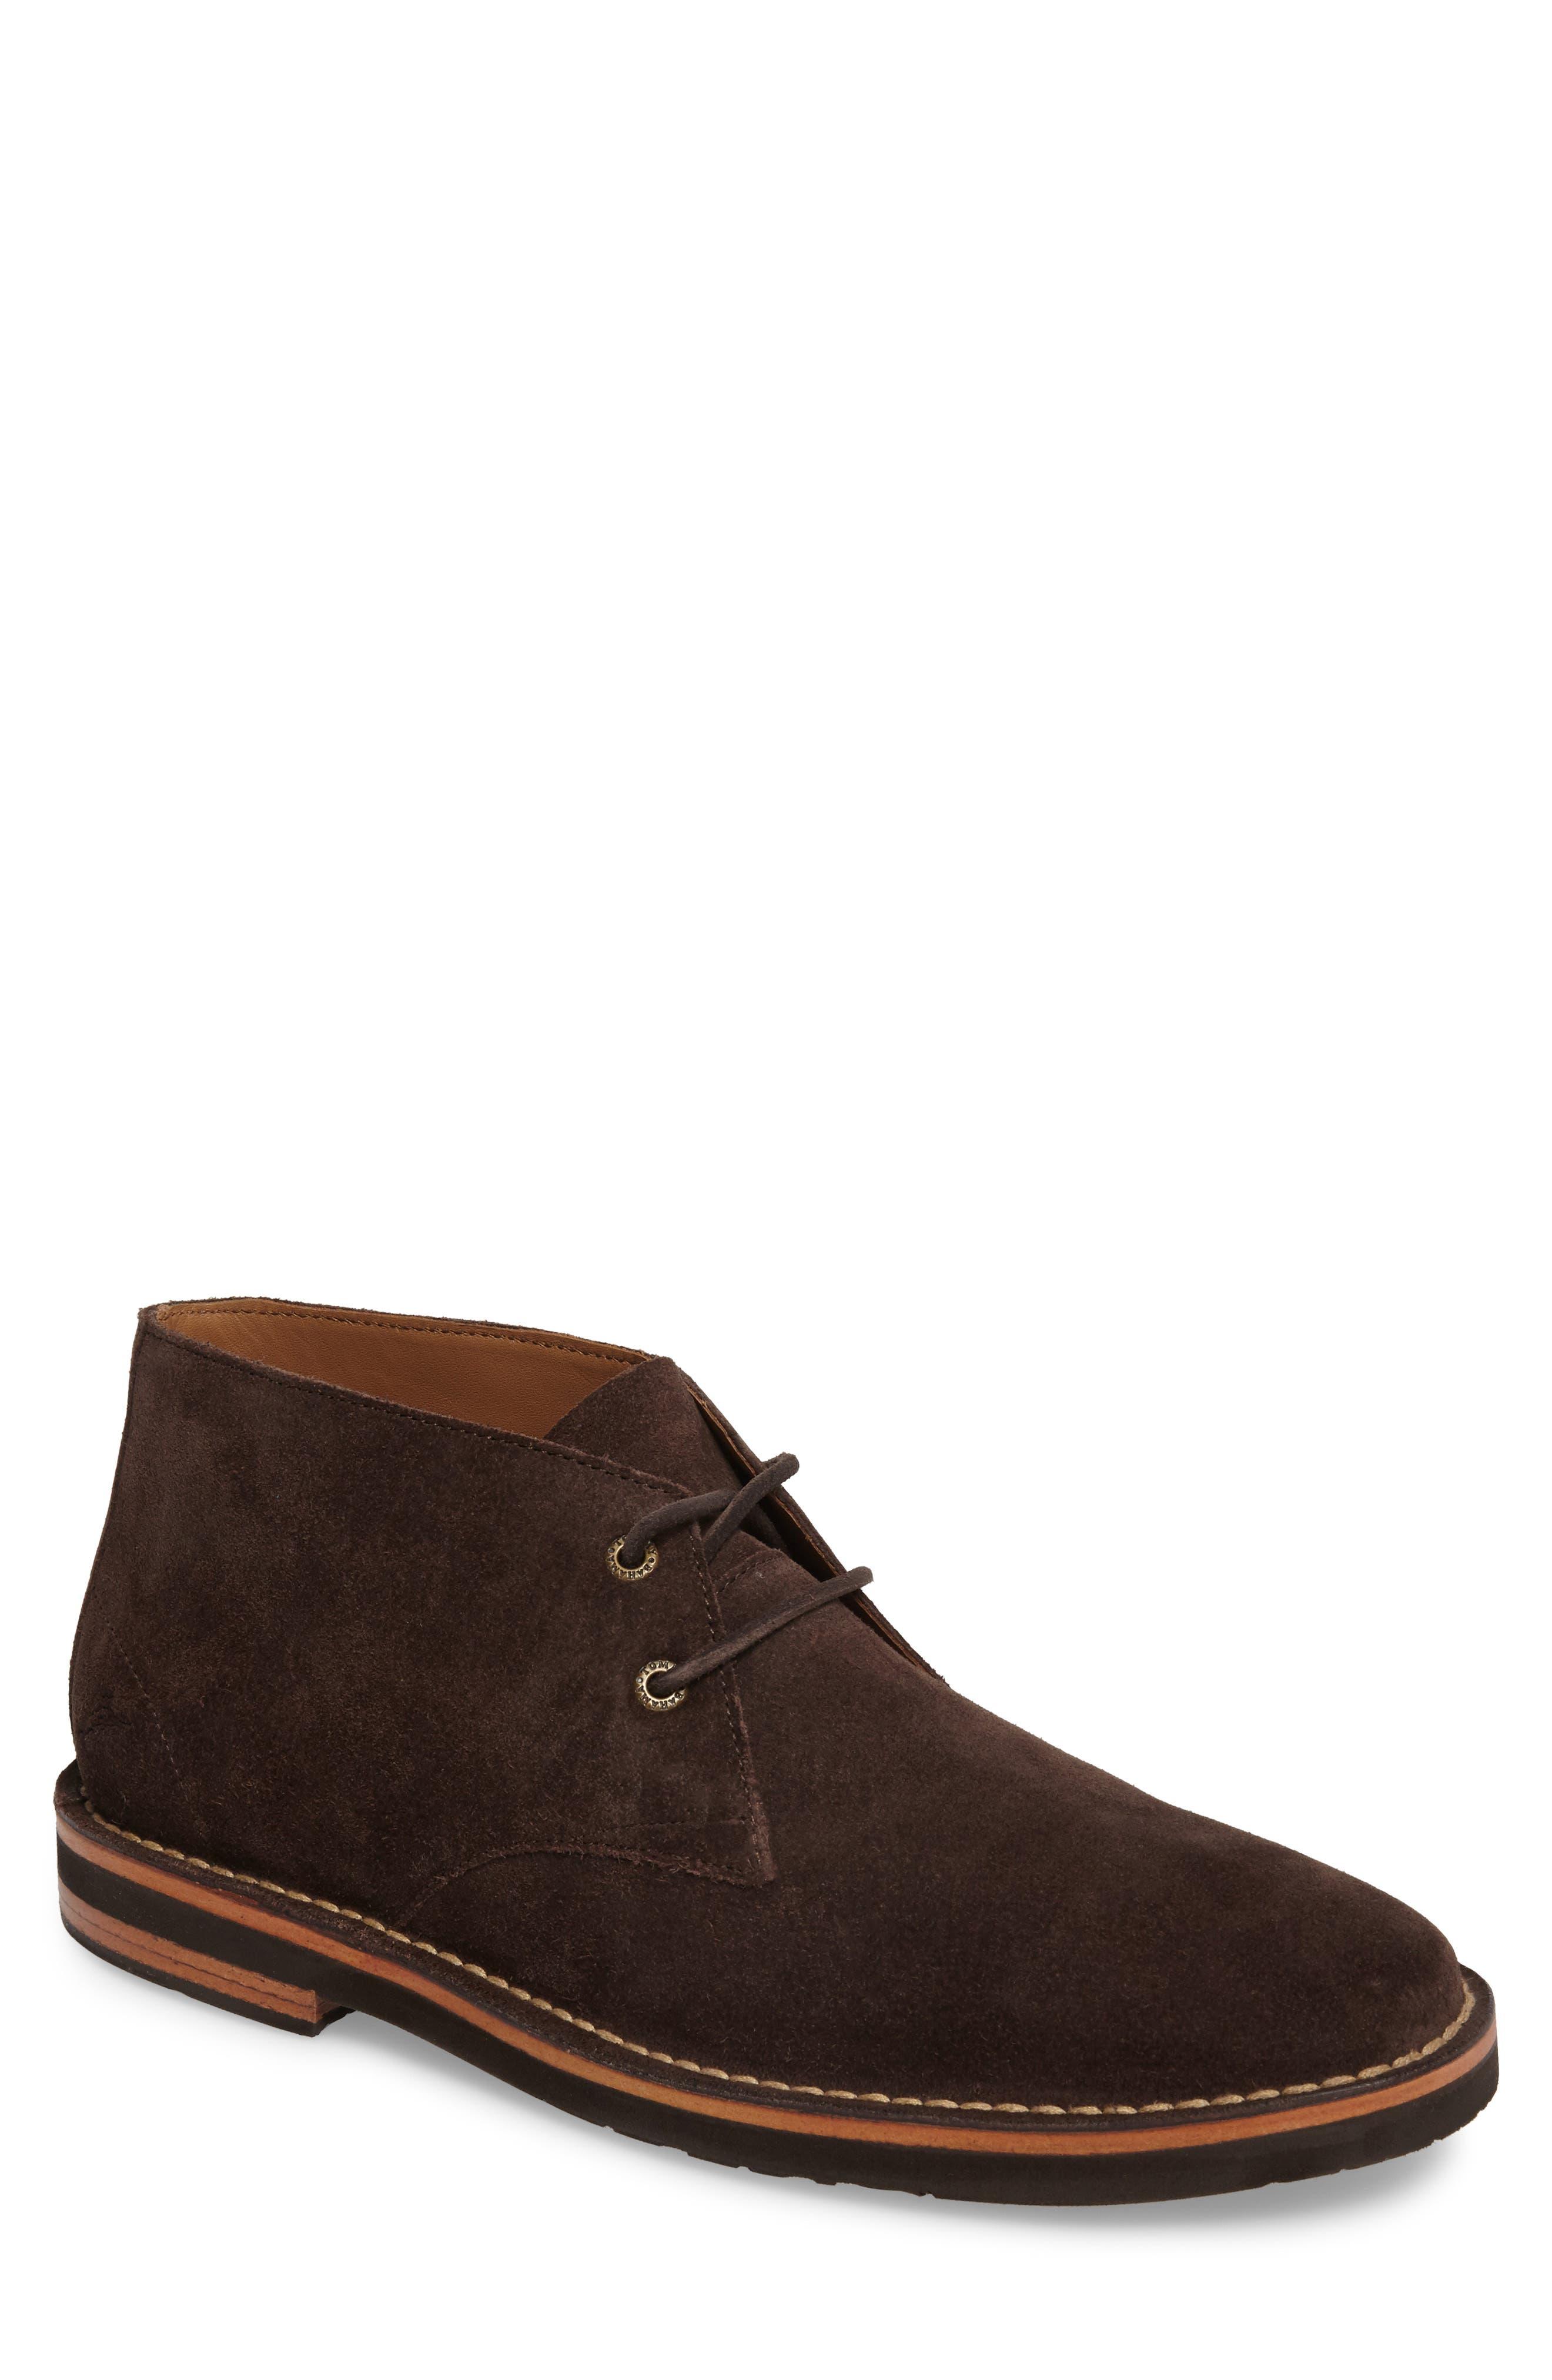 Nassau Chukka Boot,                         Main,                         color, Dark Brown Suede